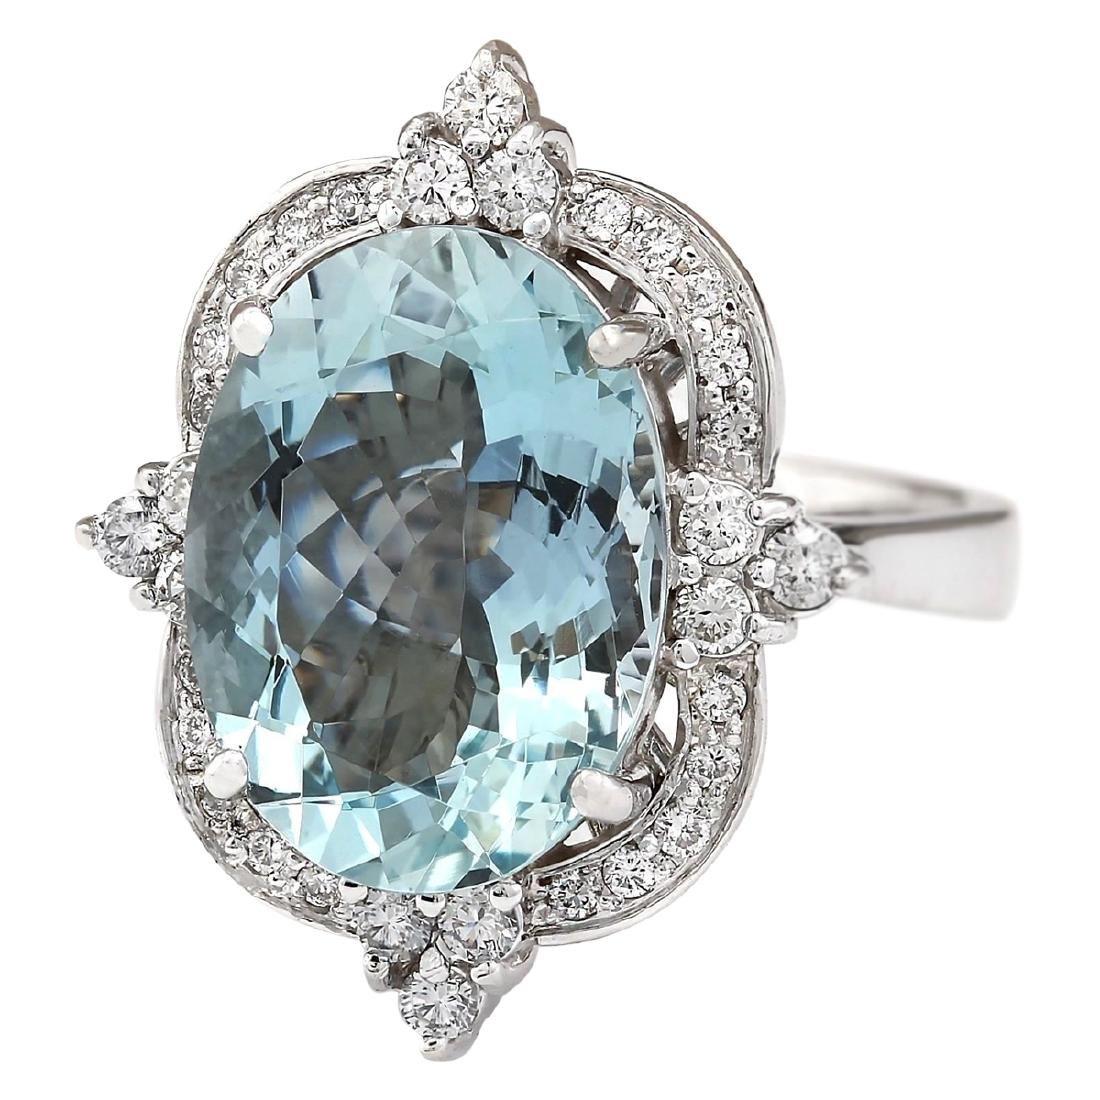 8.22 CTW Natural Aquamarine And Diamond Ring In 18K - 2